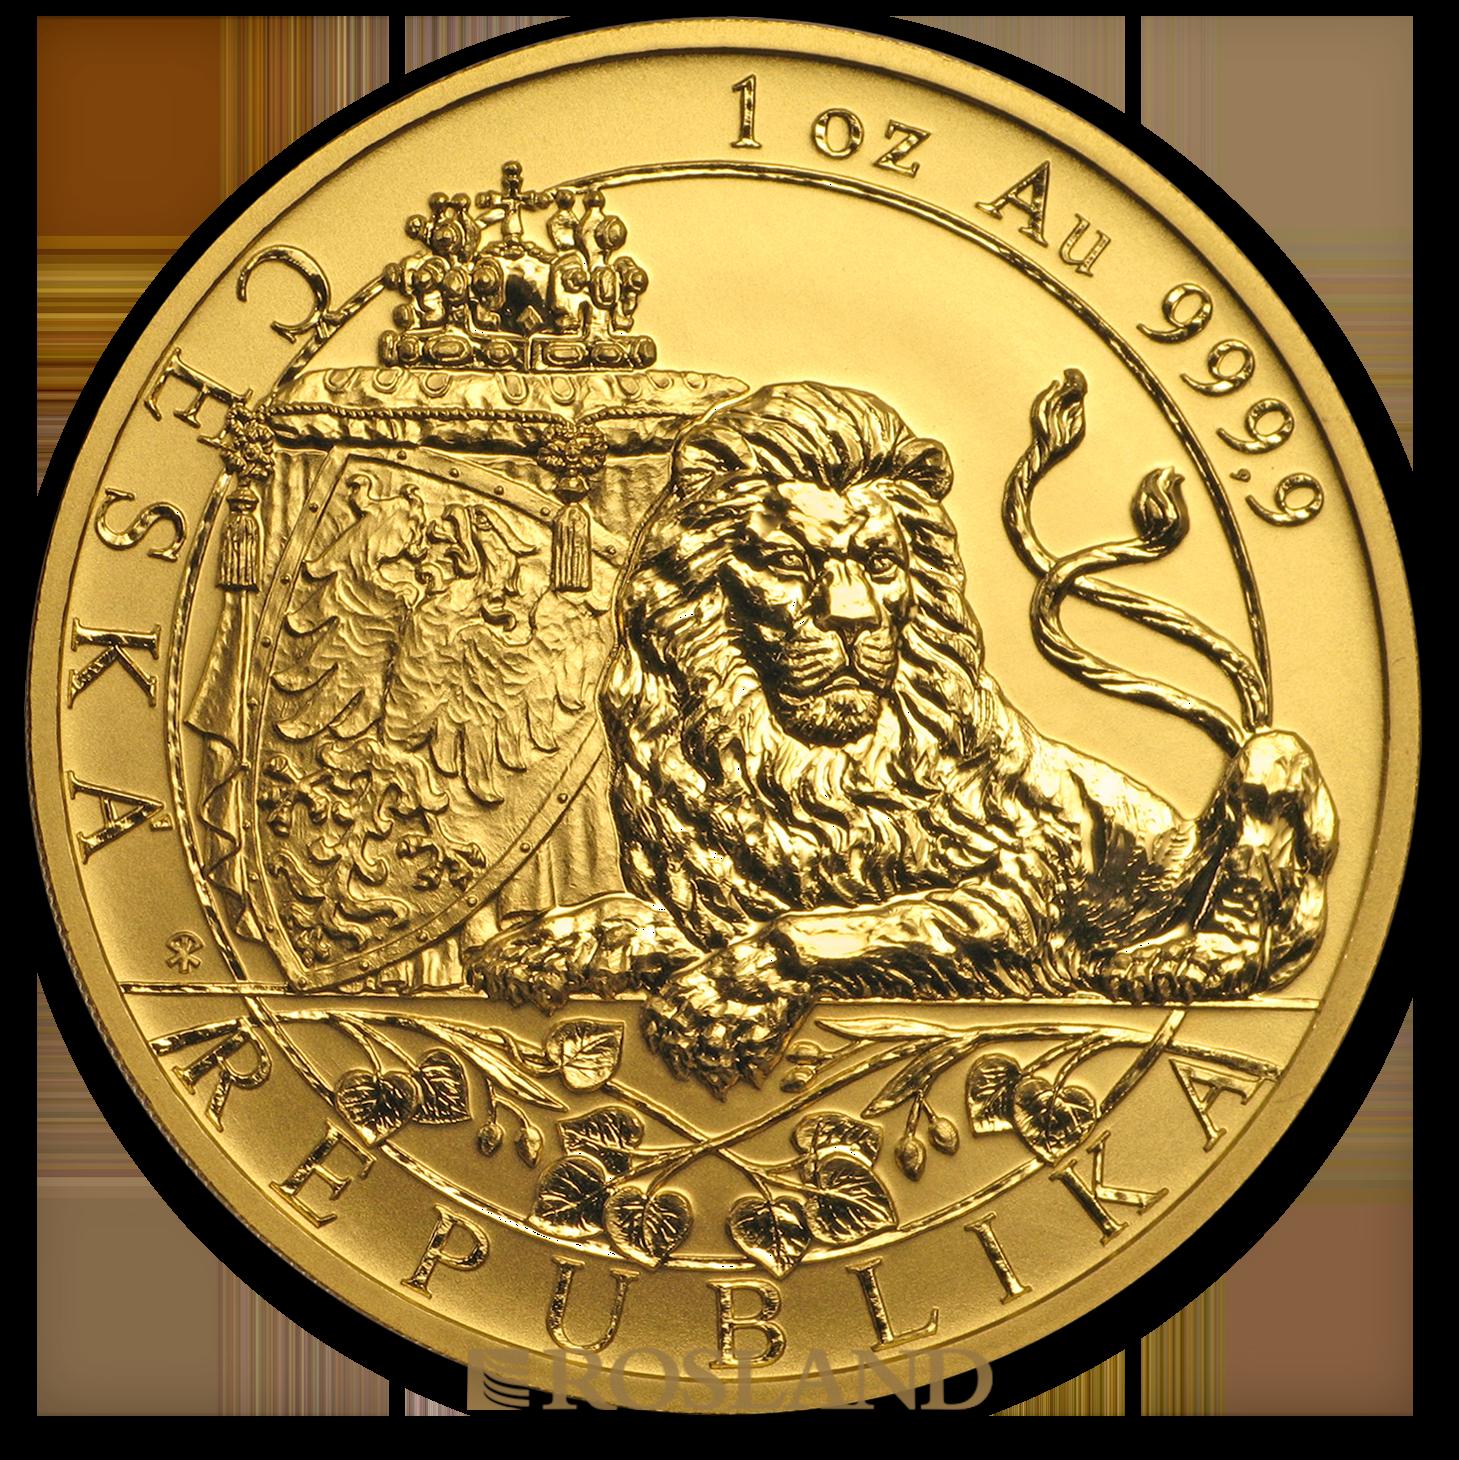 1 Unze Goldmünze Tschechischer Löwe 2018 PP